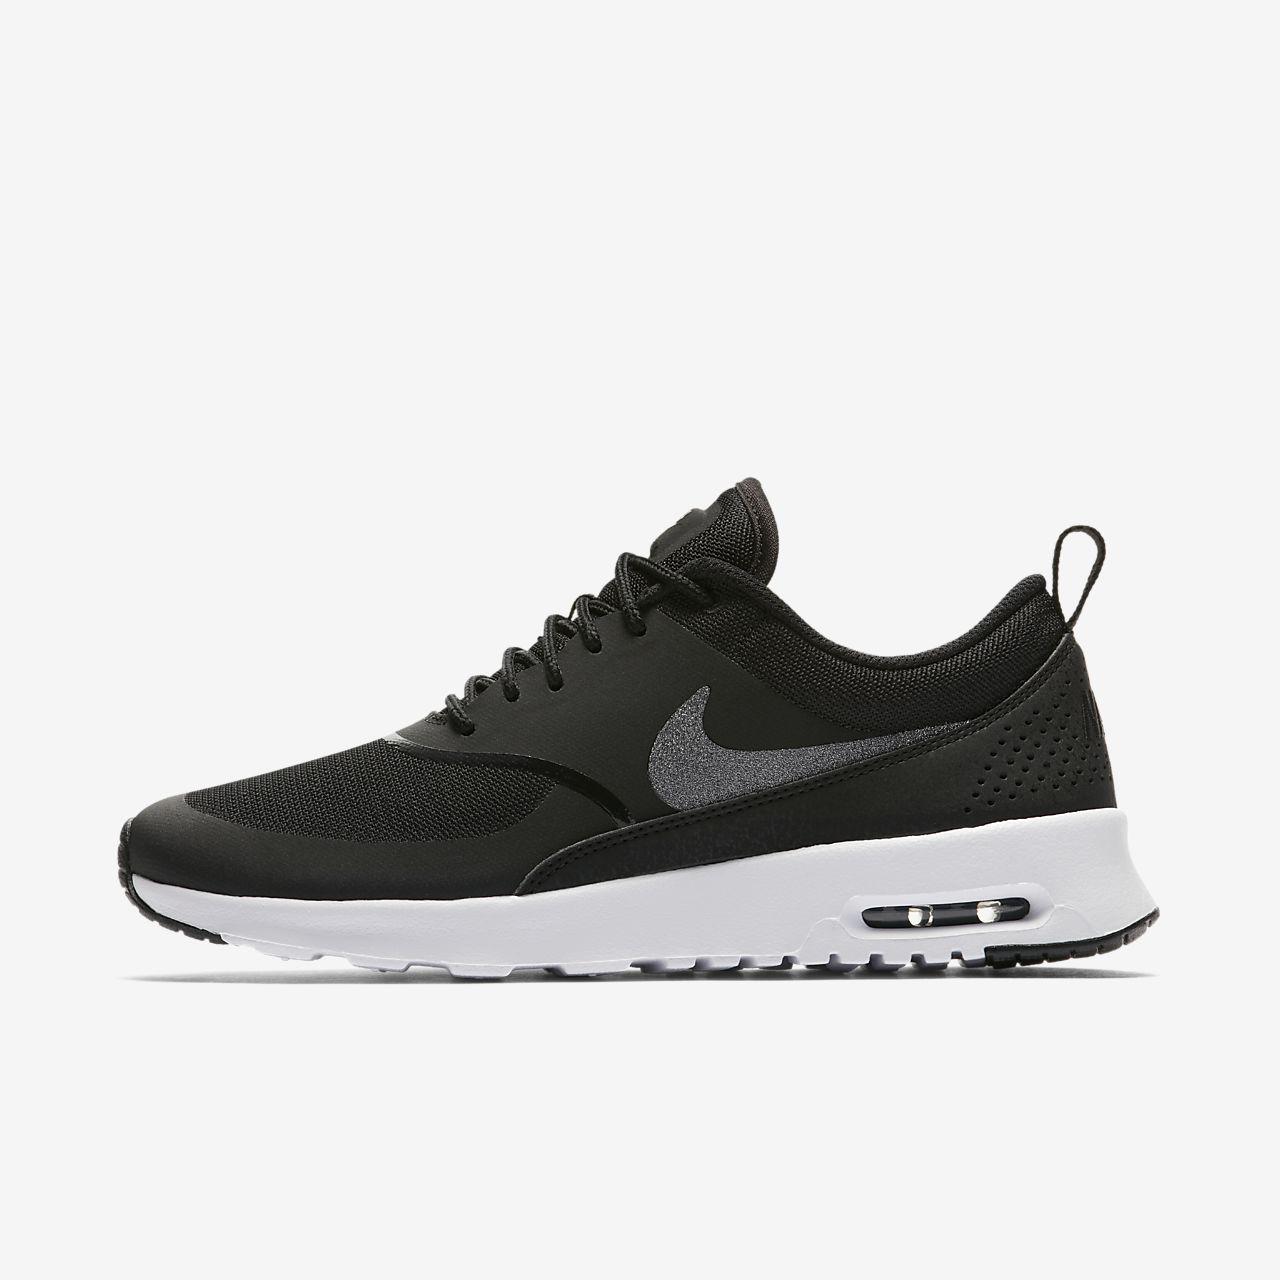 online retailer 961d0 b78e0 ... france nike air max thea glitter womens shoe 4114d 8555a